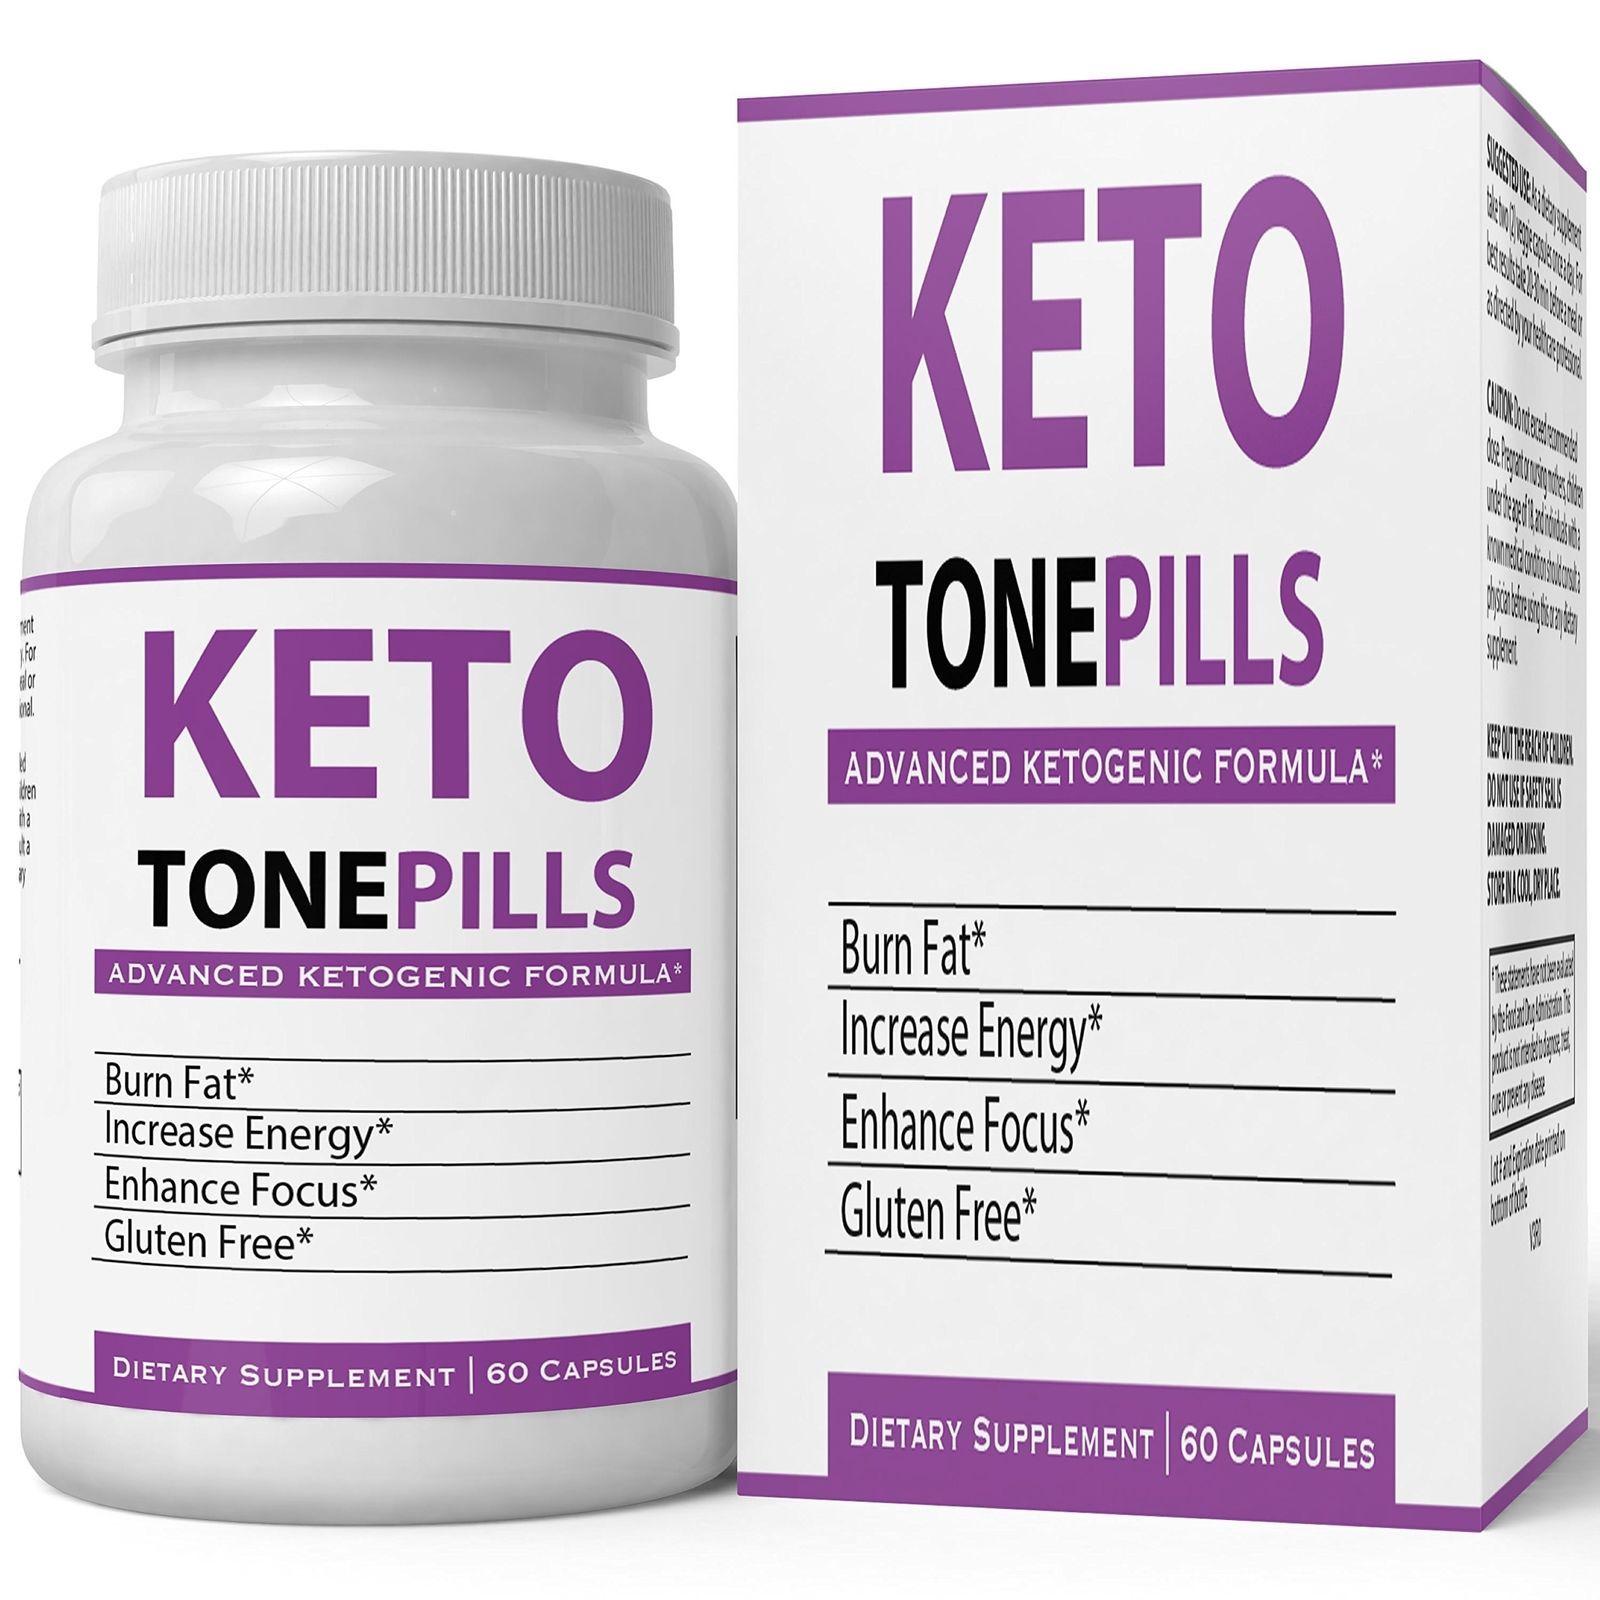 Keto Tone Pills Weightloss Supplement Keto Diet Tablets